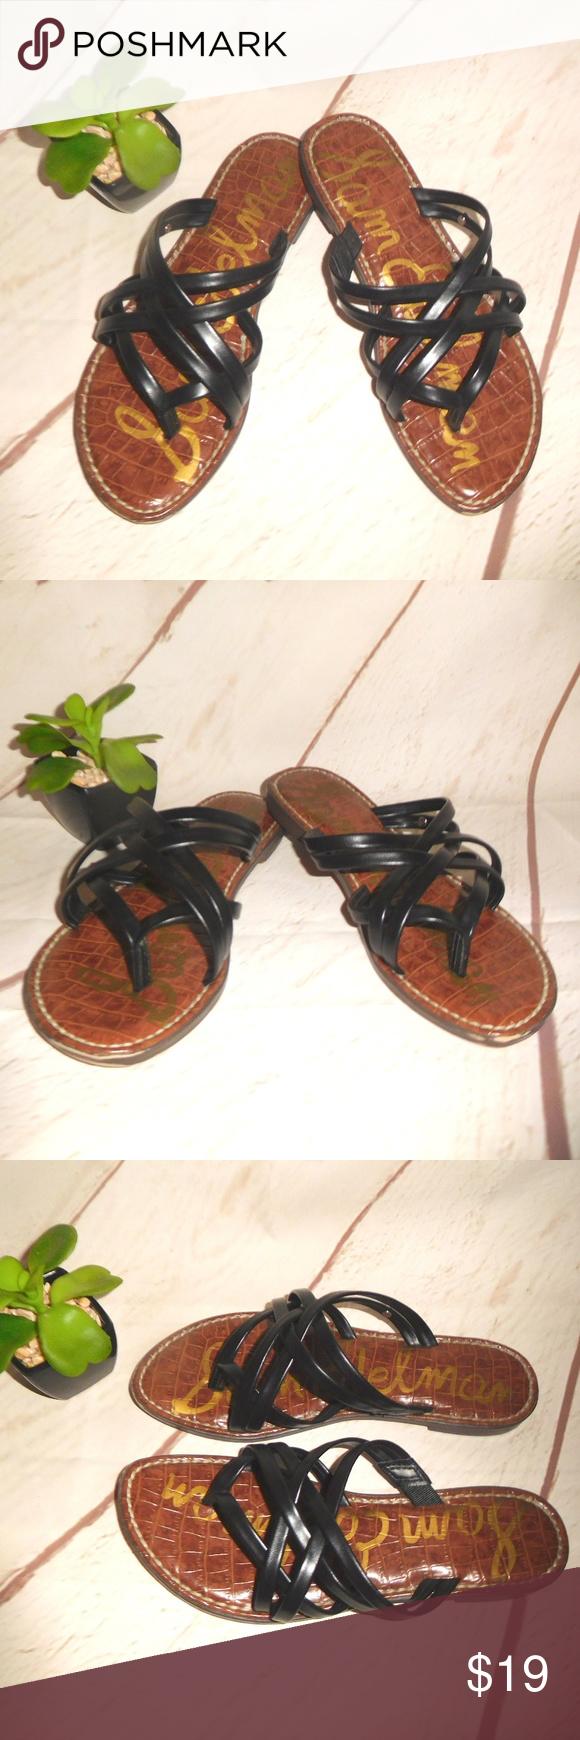 d316c03b23db Sam Edelman Georgette Black Leather Slide Sandals - very nice Sam Edelman  Black Leather